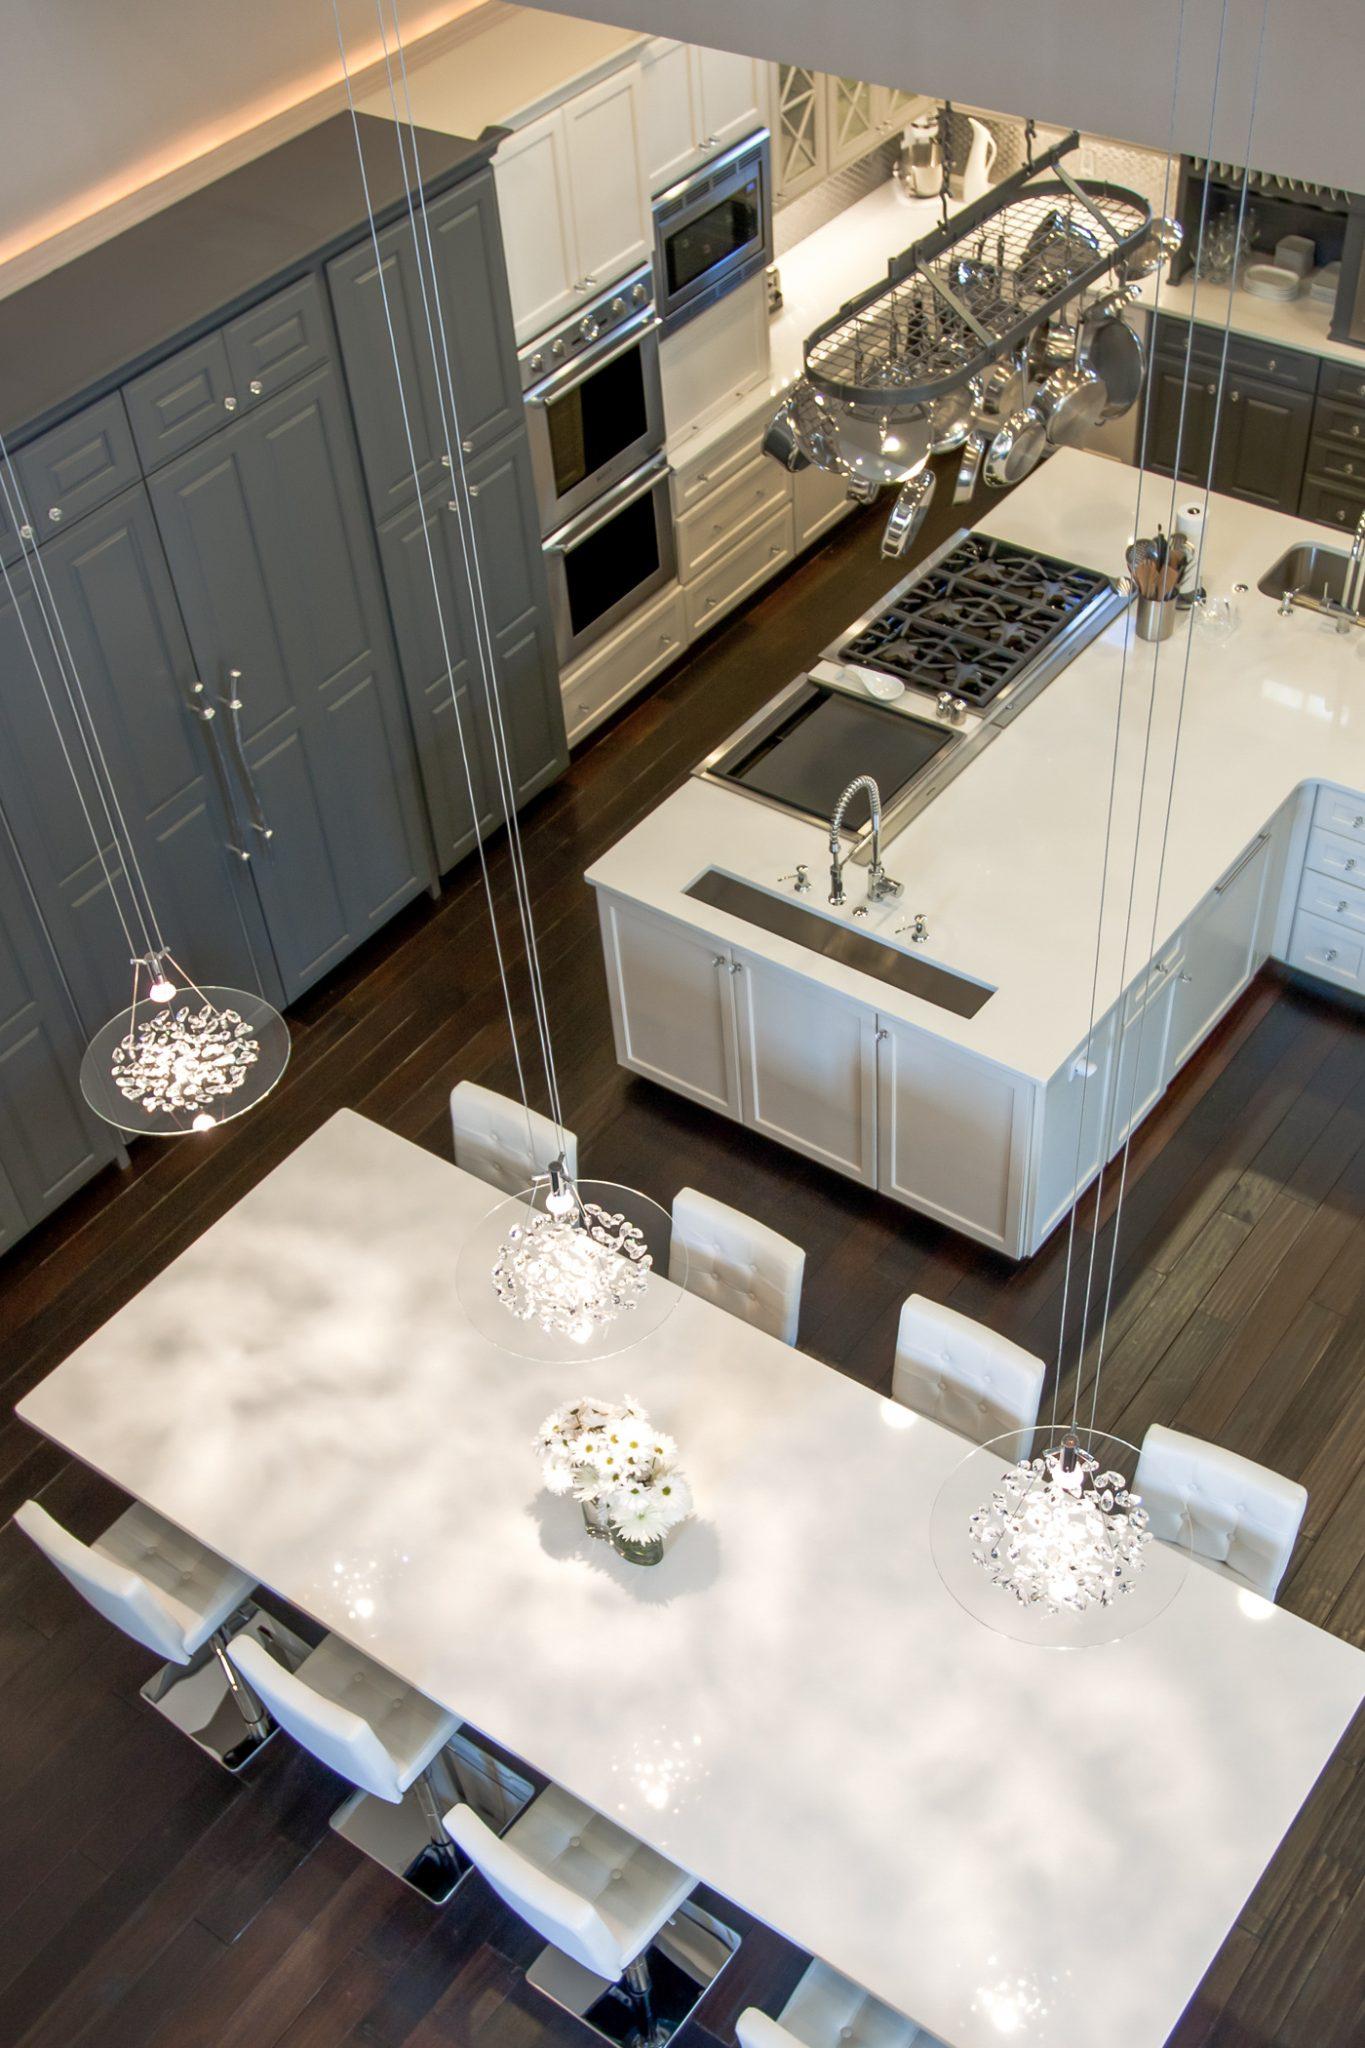 kitchens etc kitchen design on 30a 8 Kitchens Etc 30A